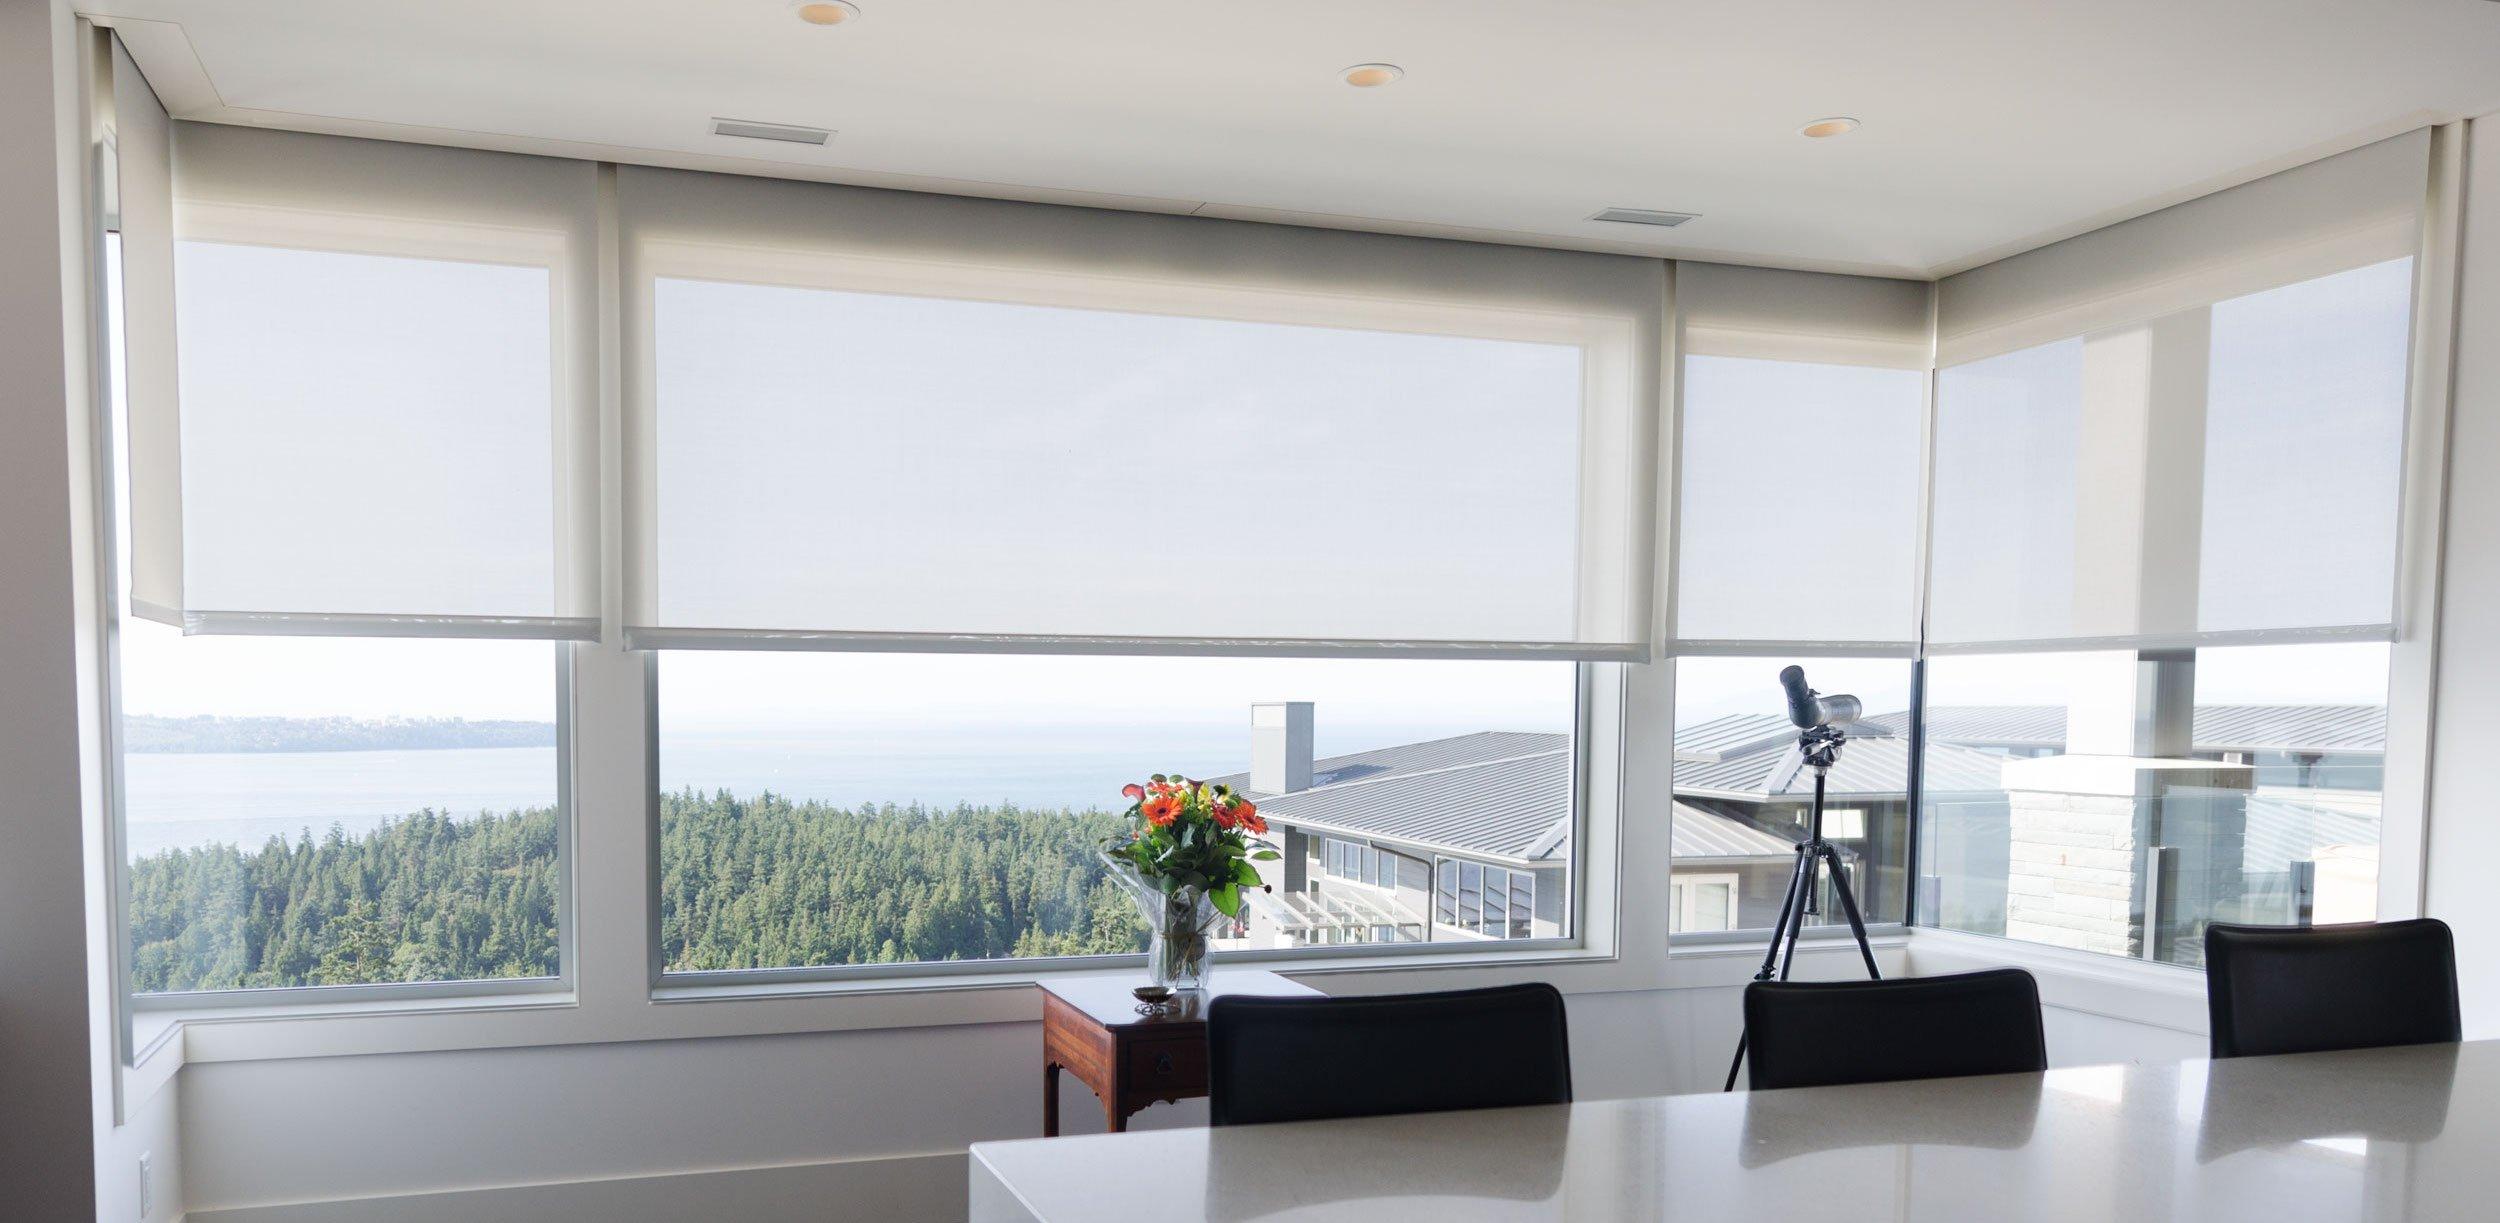 motorized blinds electric motorized shades and blinds   nyc long island u0026 brooklyn SDNUKQE